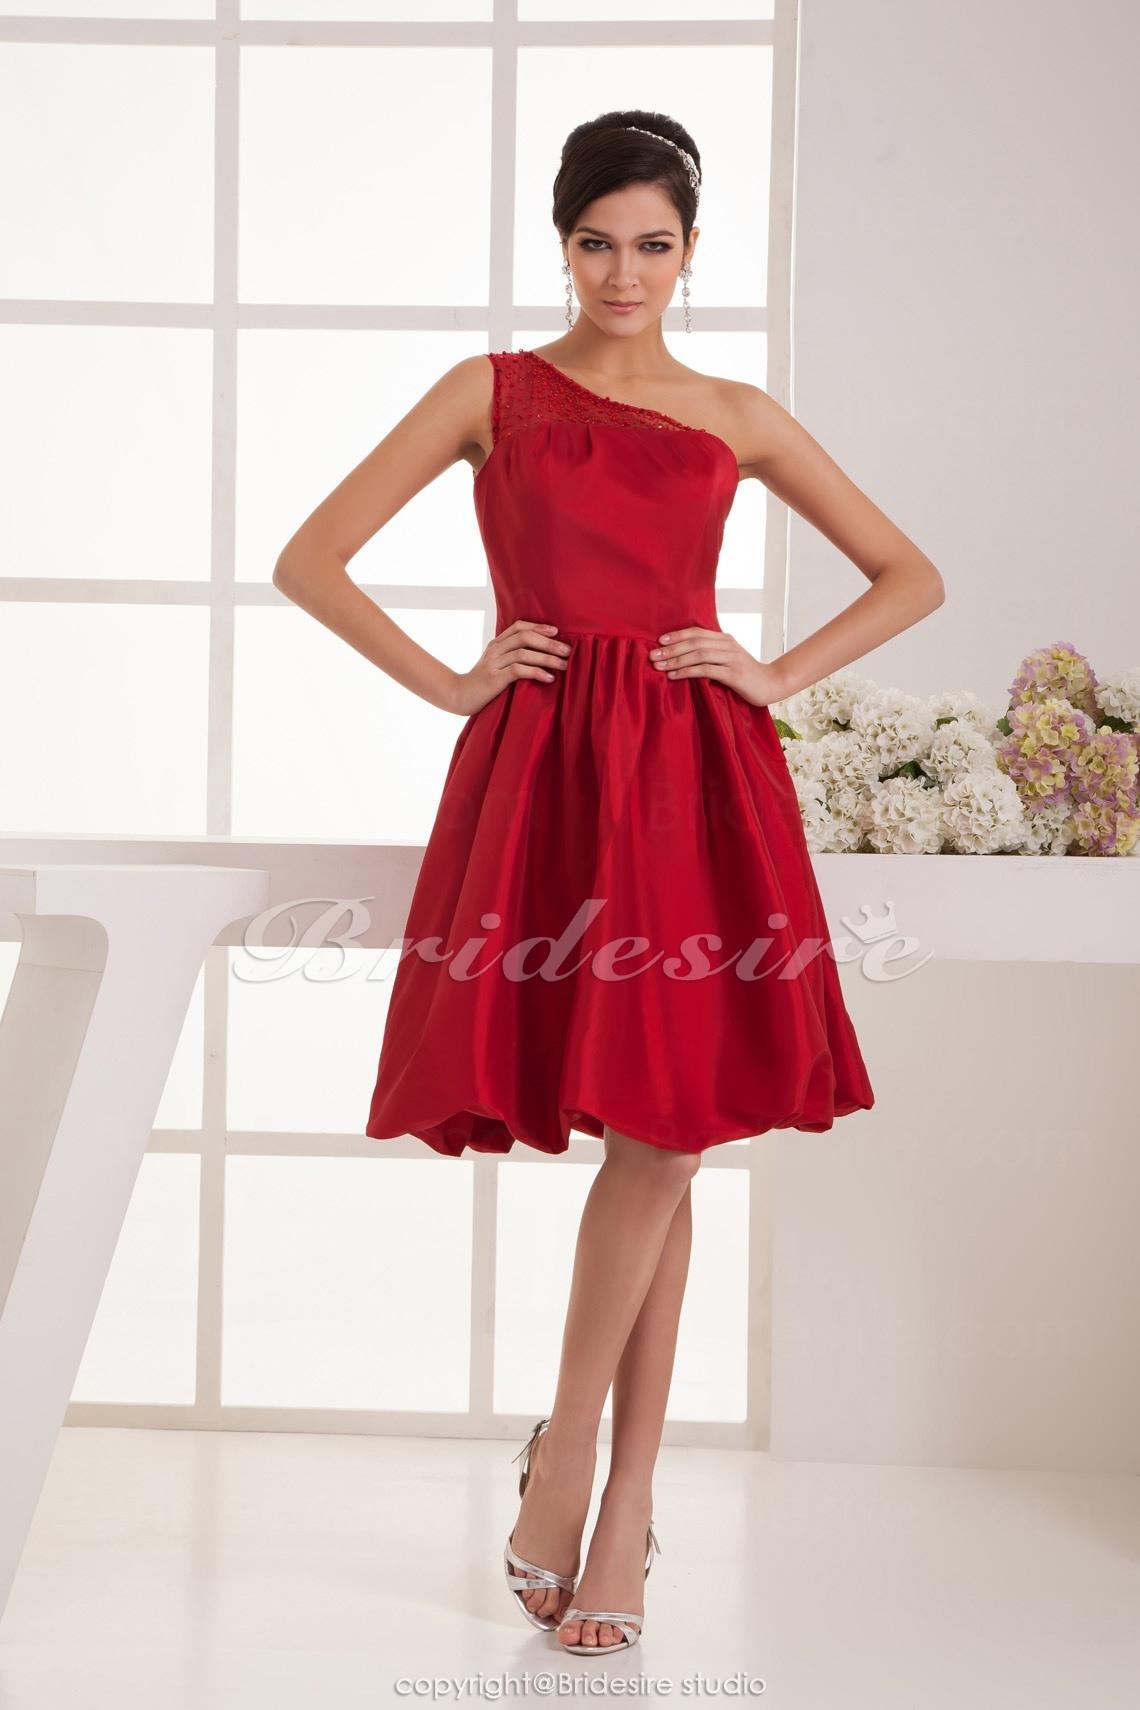 10 Genial Rotes Kleid Festlich SpezialgebietAbend Cool Rotes Kleid Festlich für 2019